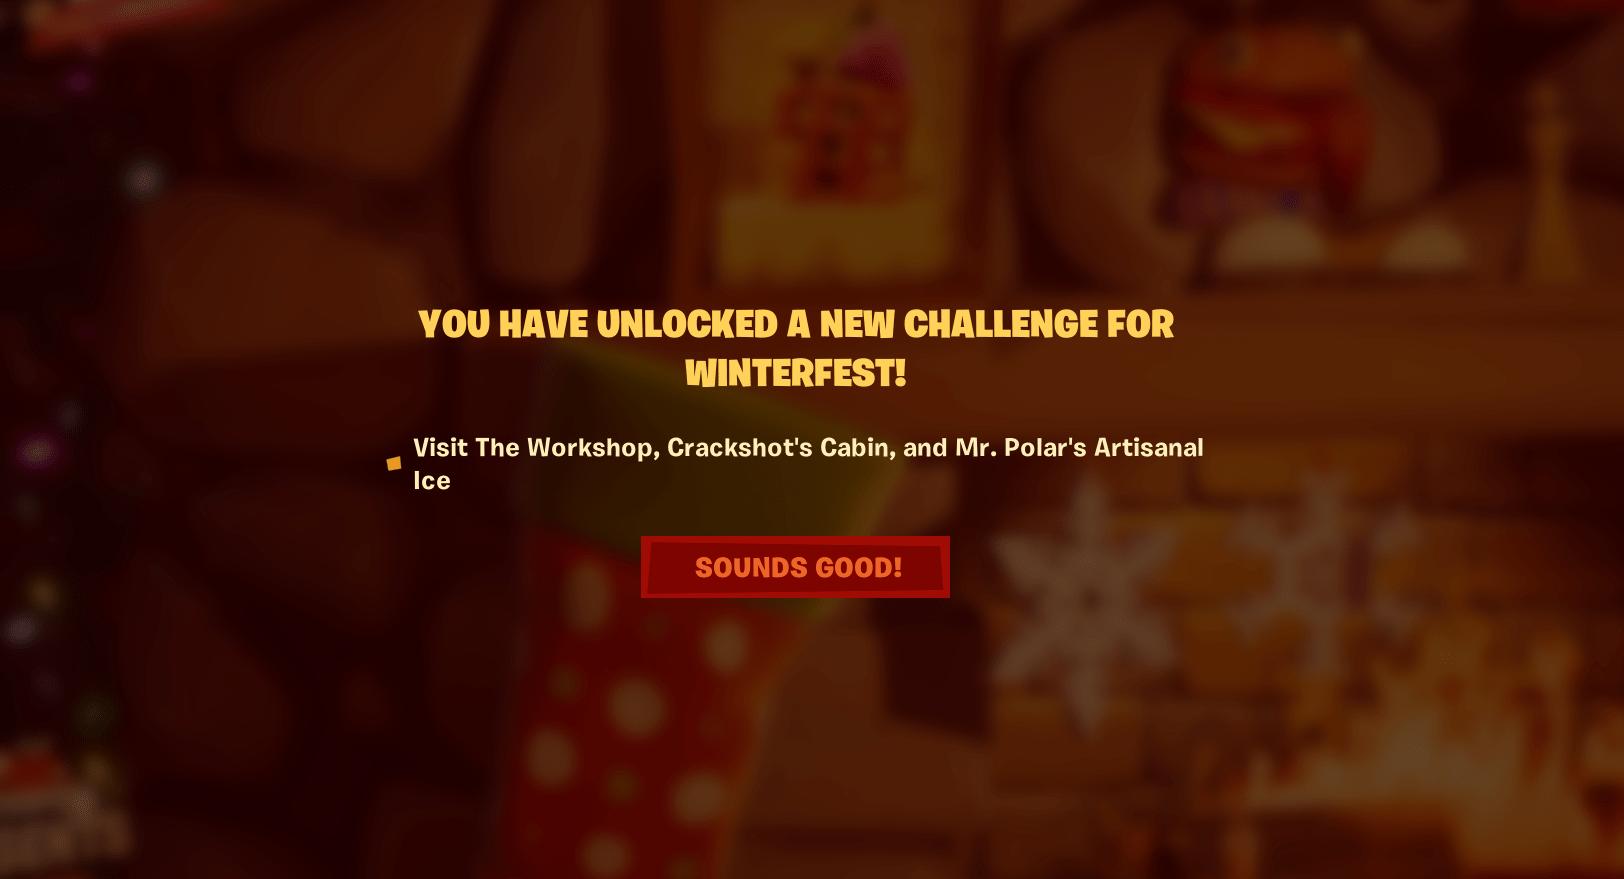 Fortnite Winterfest Day 14 Challenge Unlocked